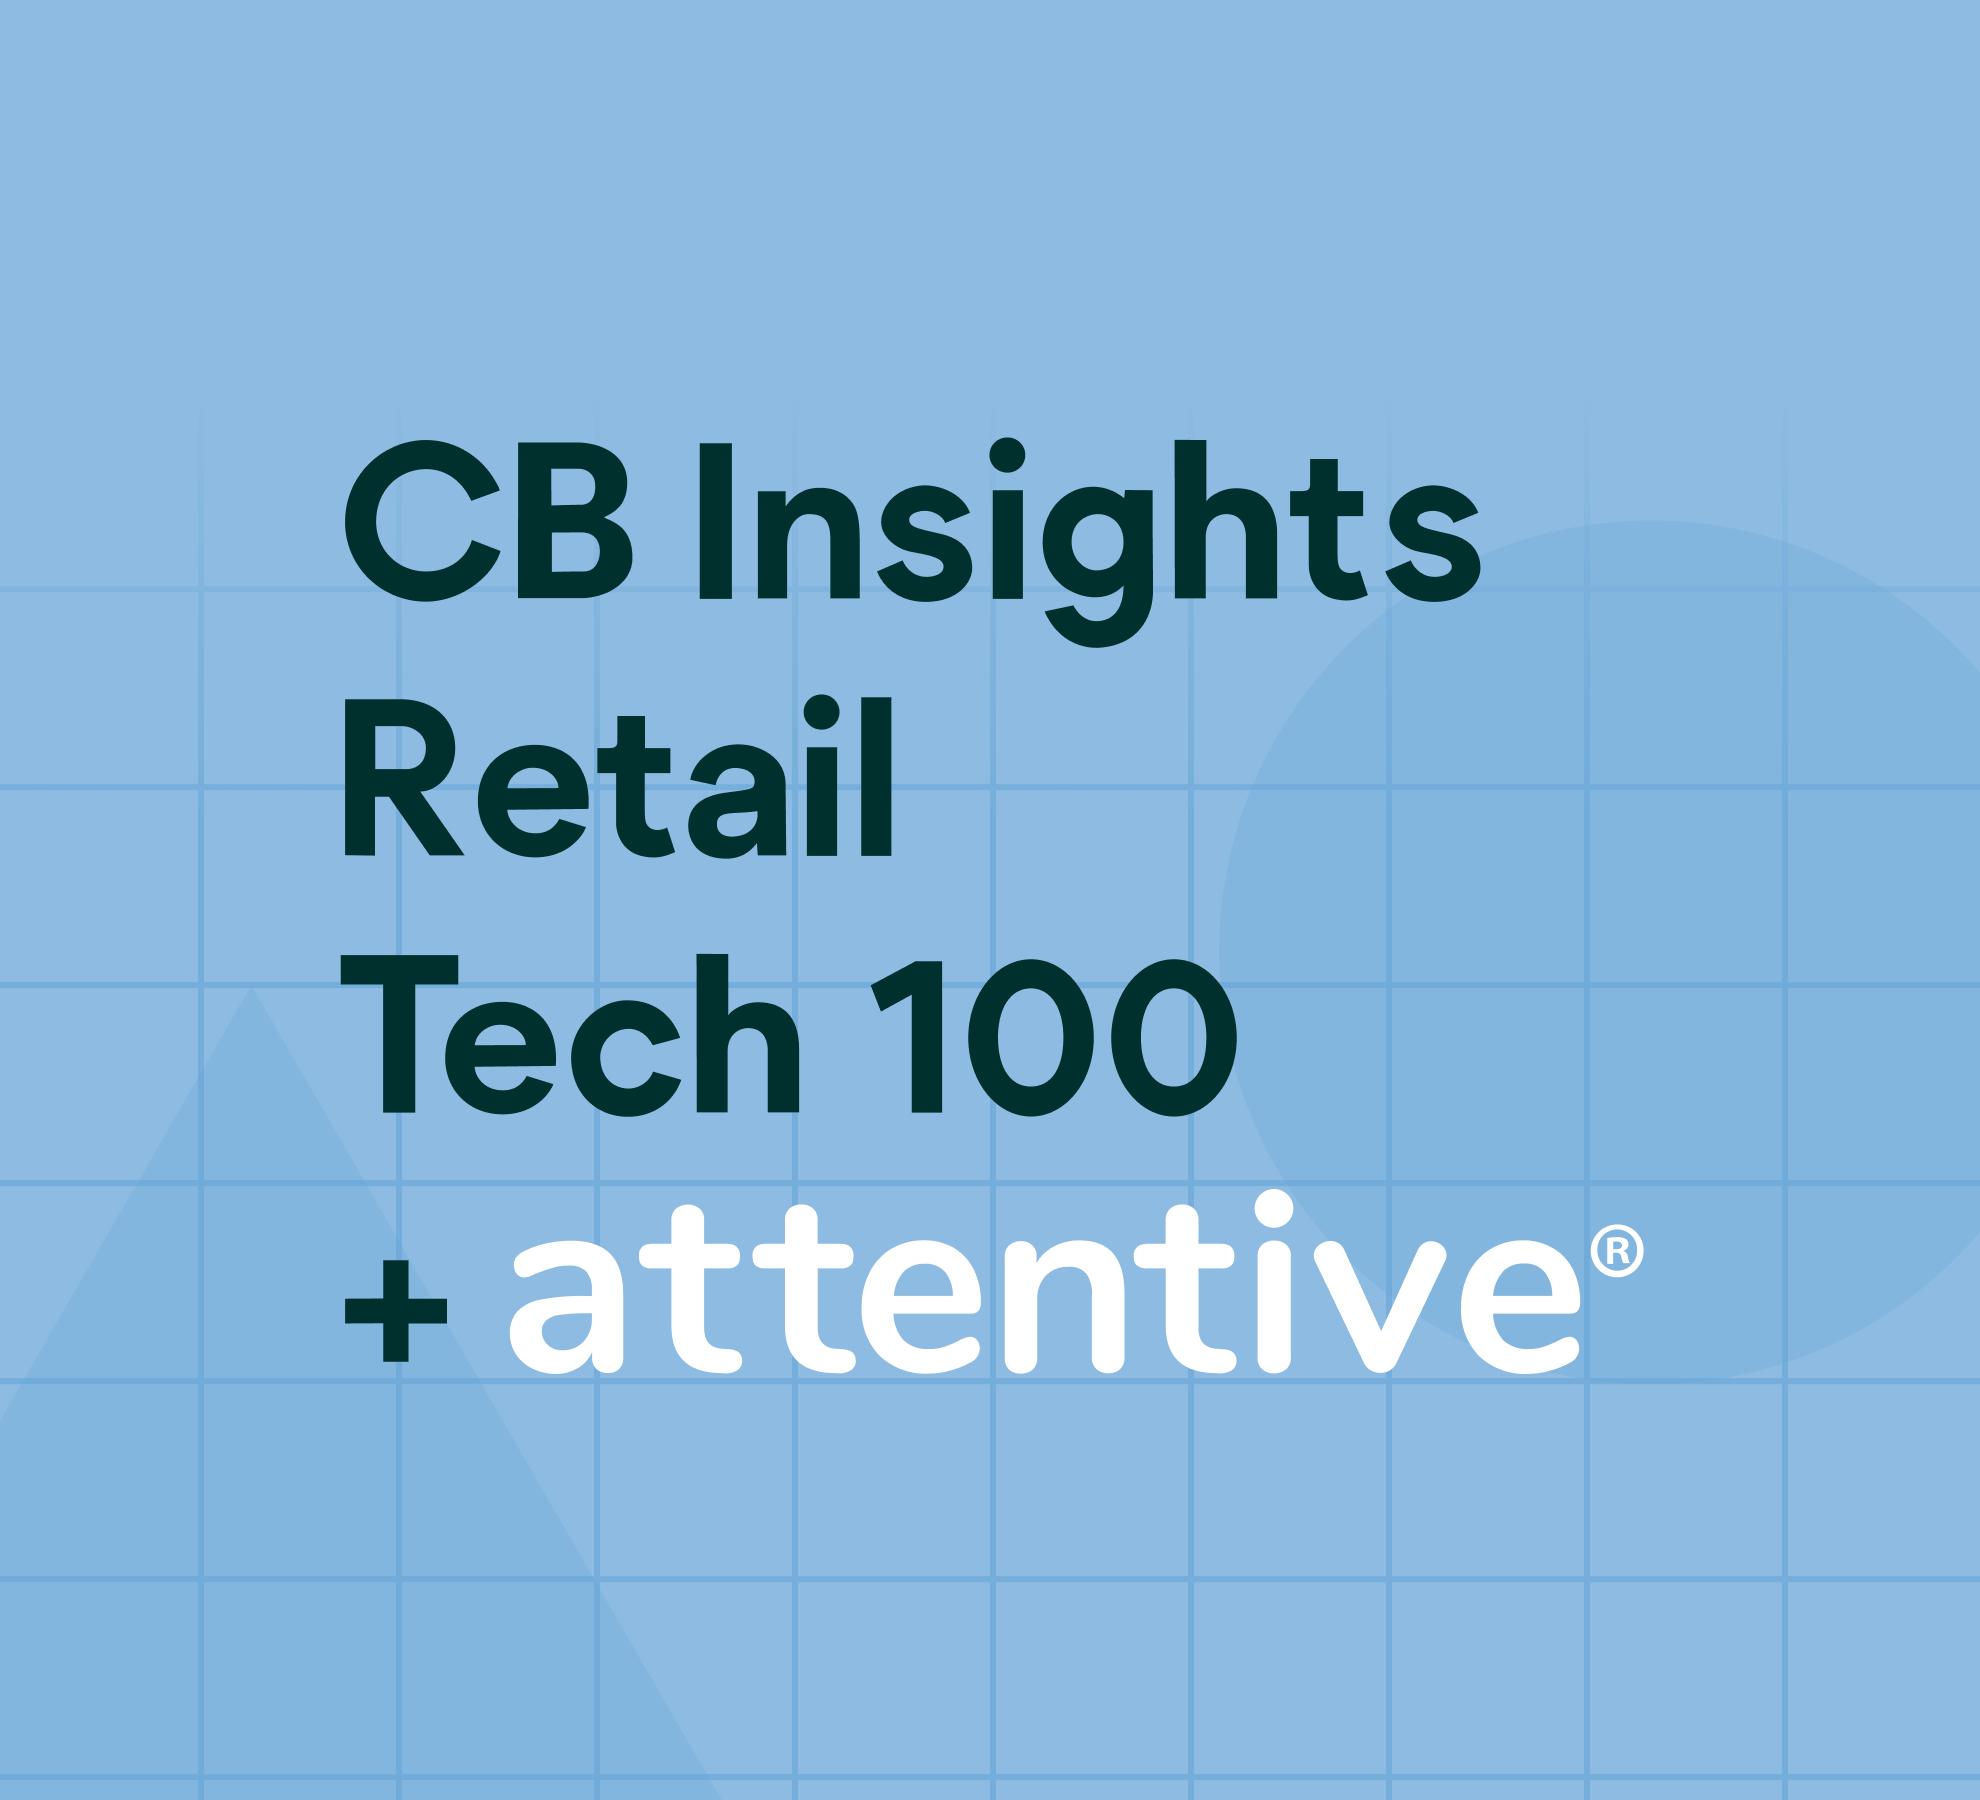 CB Insights Tech 100